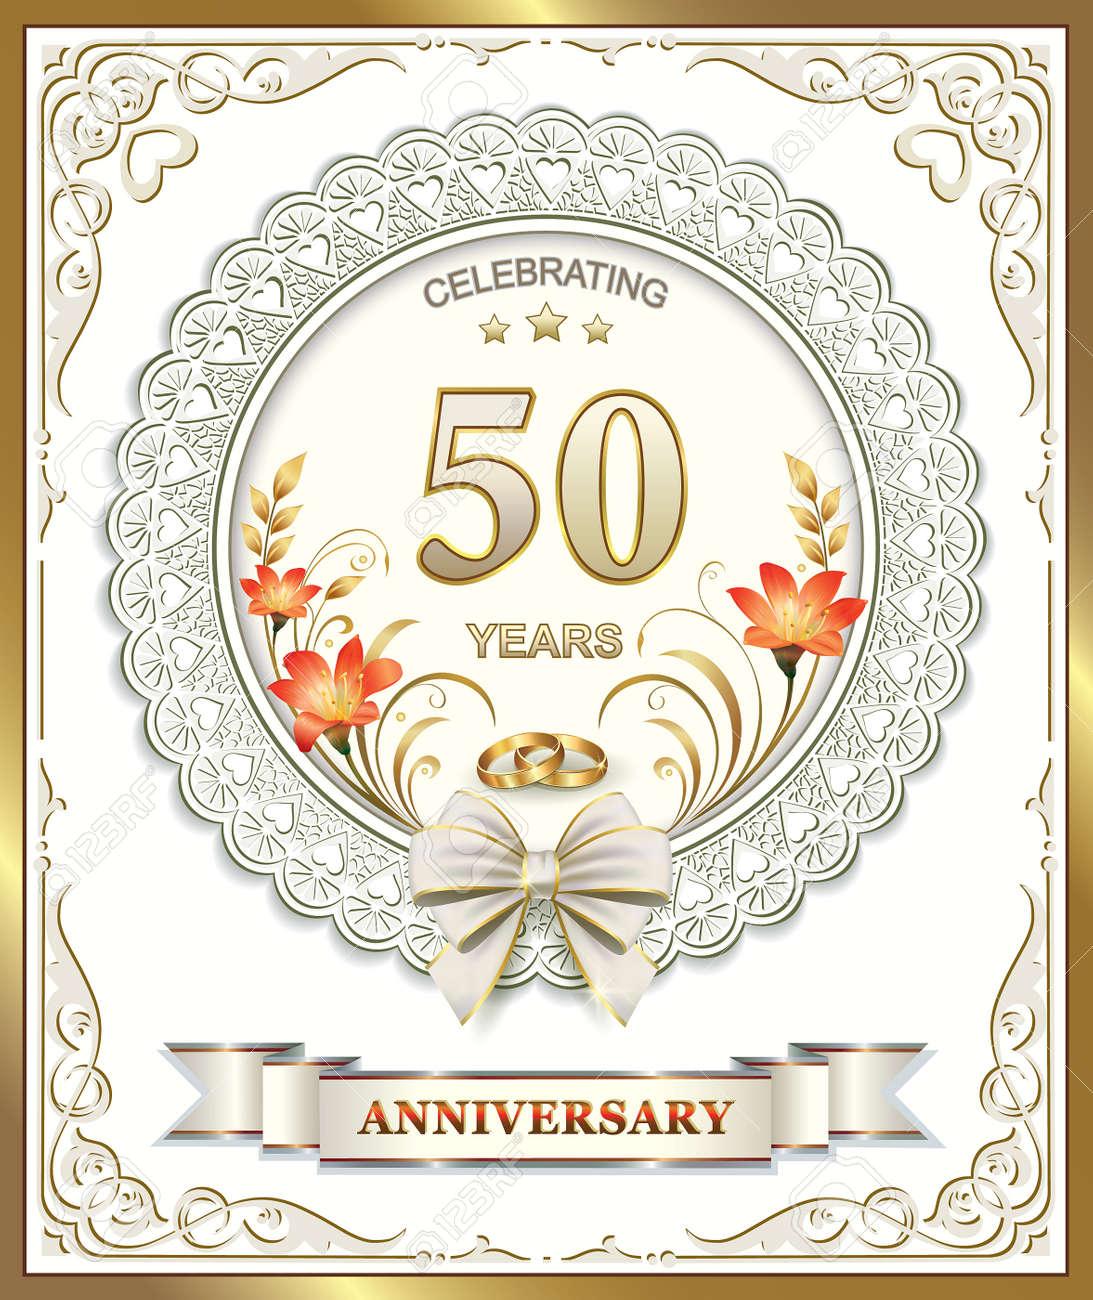 Peculiar Wedding Anniversary Stock Vector Wedding Anniversary Royalty Free Stock 50th Wedding Anniversary Songs 50th Wedding Anniversary Decoration Ideas wedding 50th Wedding Anniversary